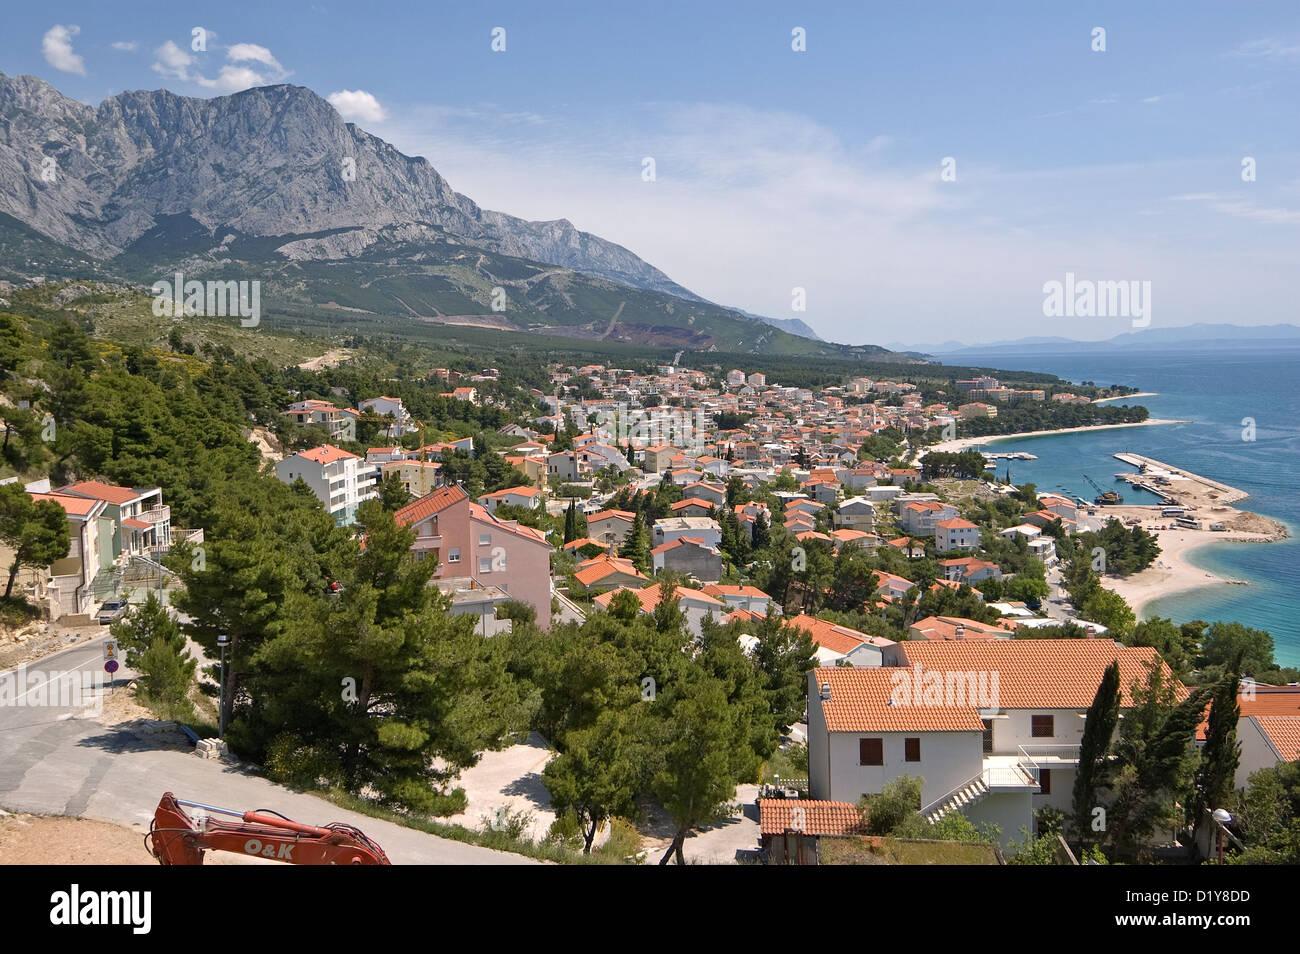 Elk192-3110 Croatia, South Dalmatian Coast, coastal towns - Stock Image